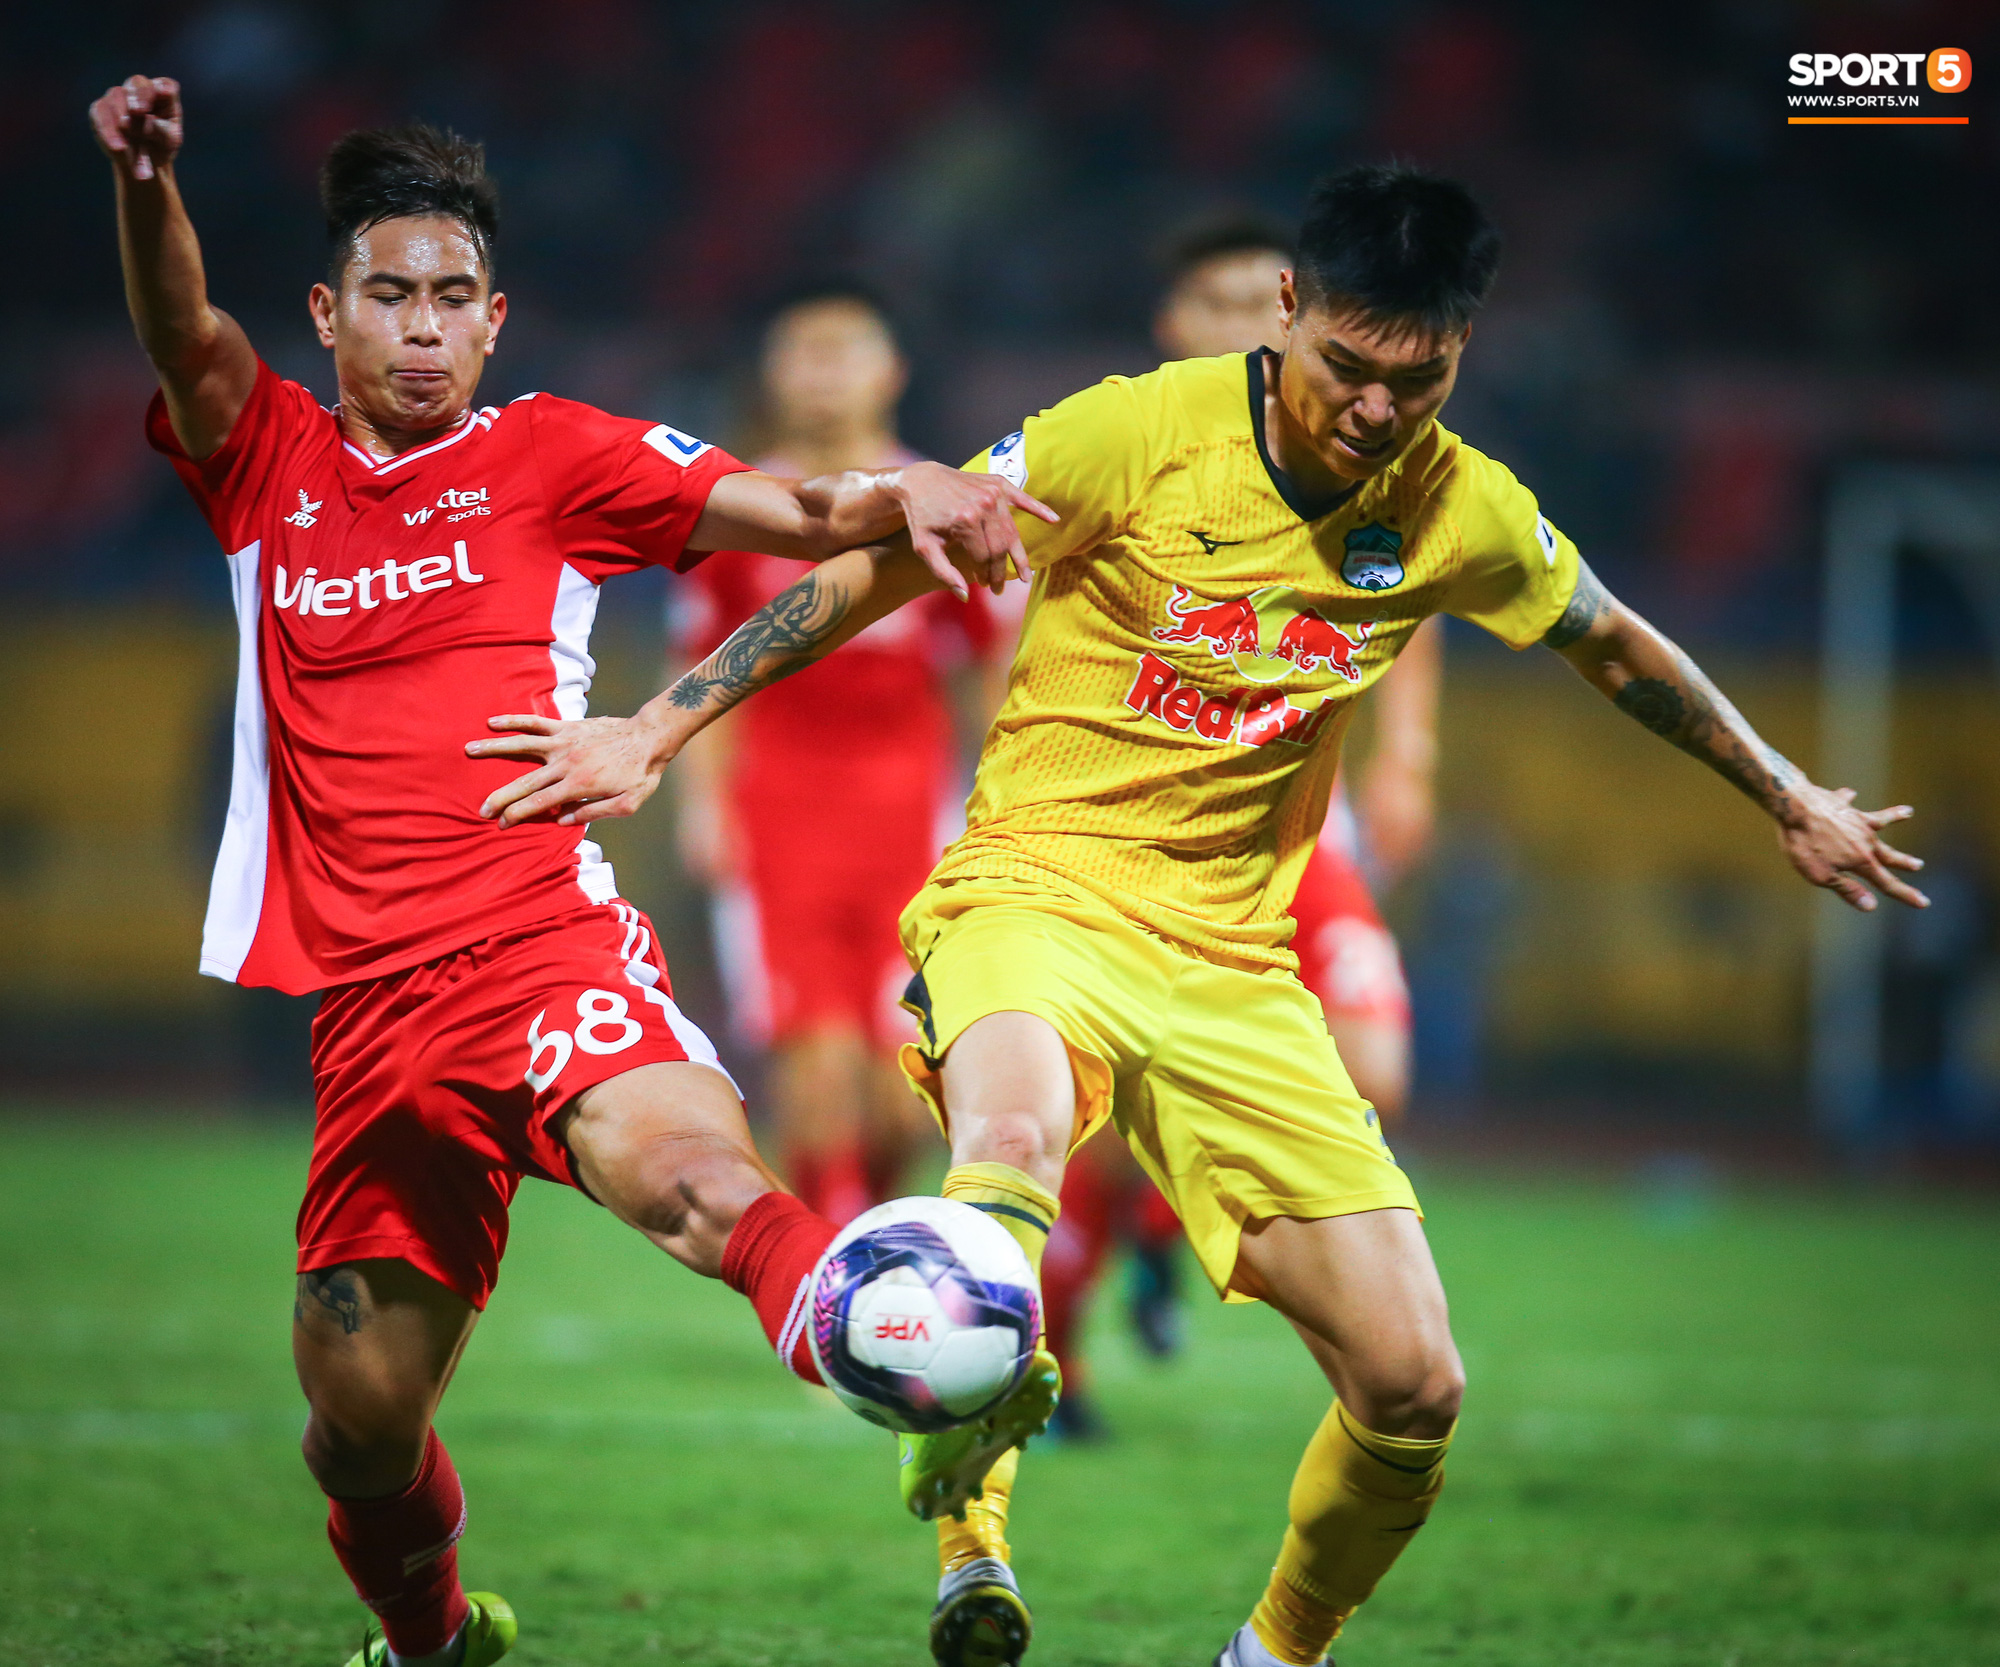 Viettel - HAGL - V.League2021 - Sơn Tùng5.jpg